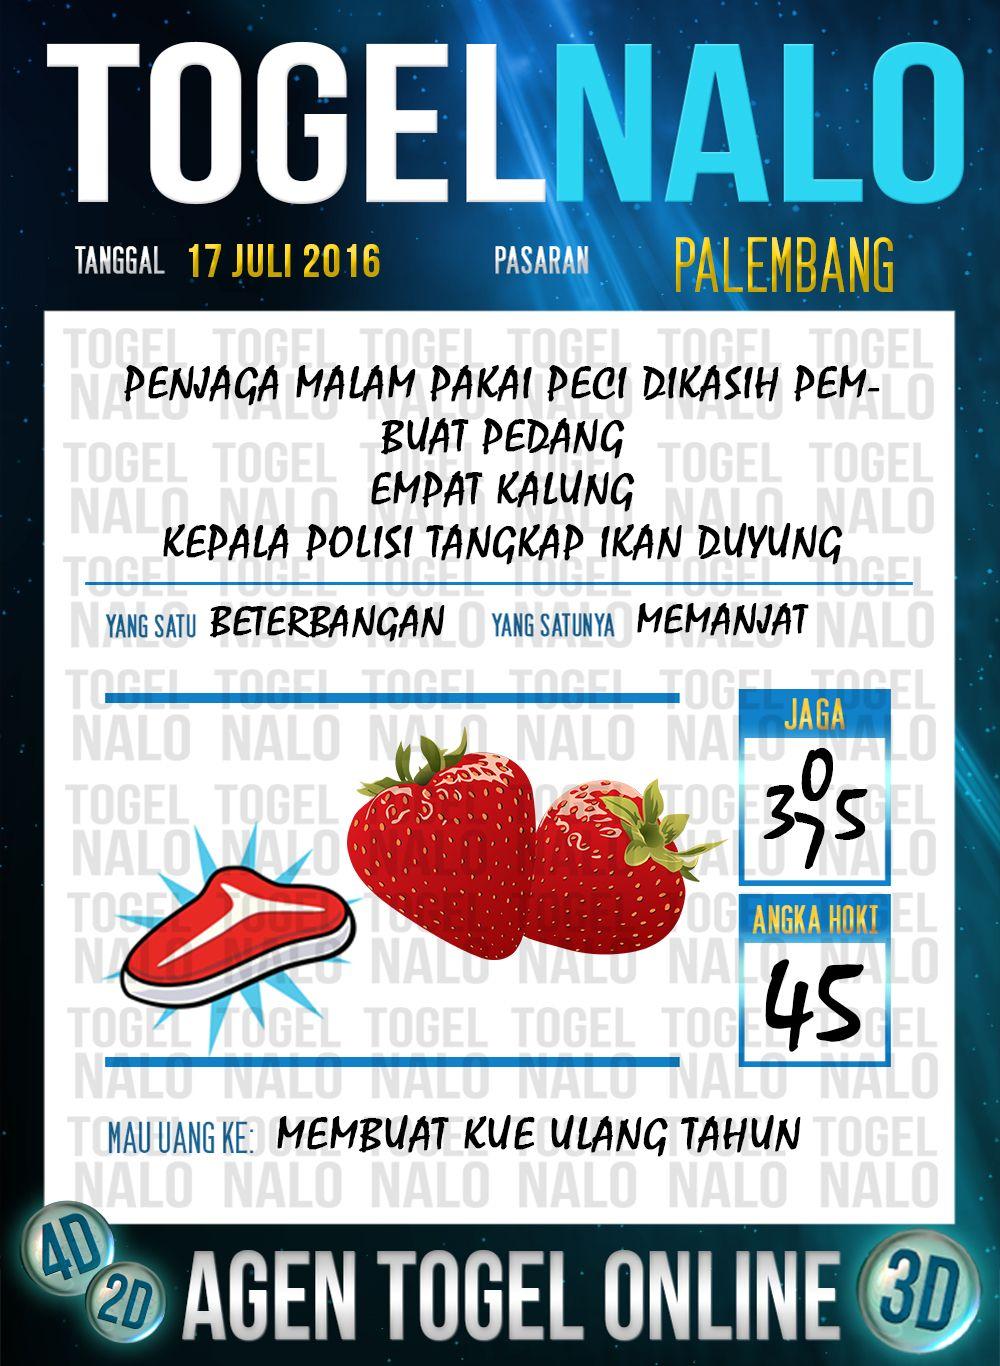 Prediksi Togel Online Live Draw 4d Togelnalo Palembang 17 Juli 2016 4 Juli 24 Juni 15 Agustus